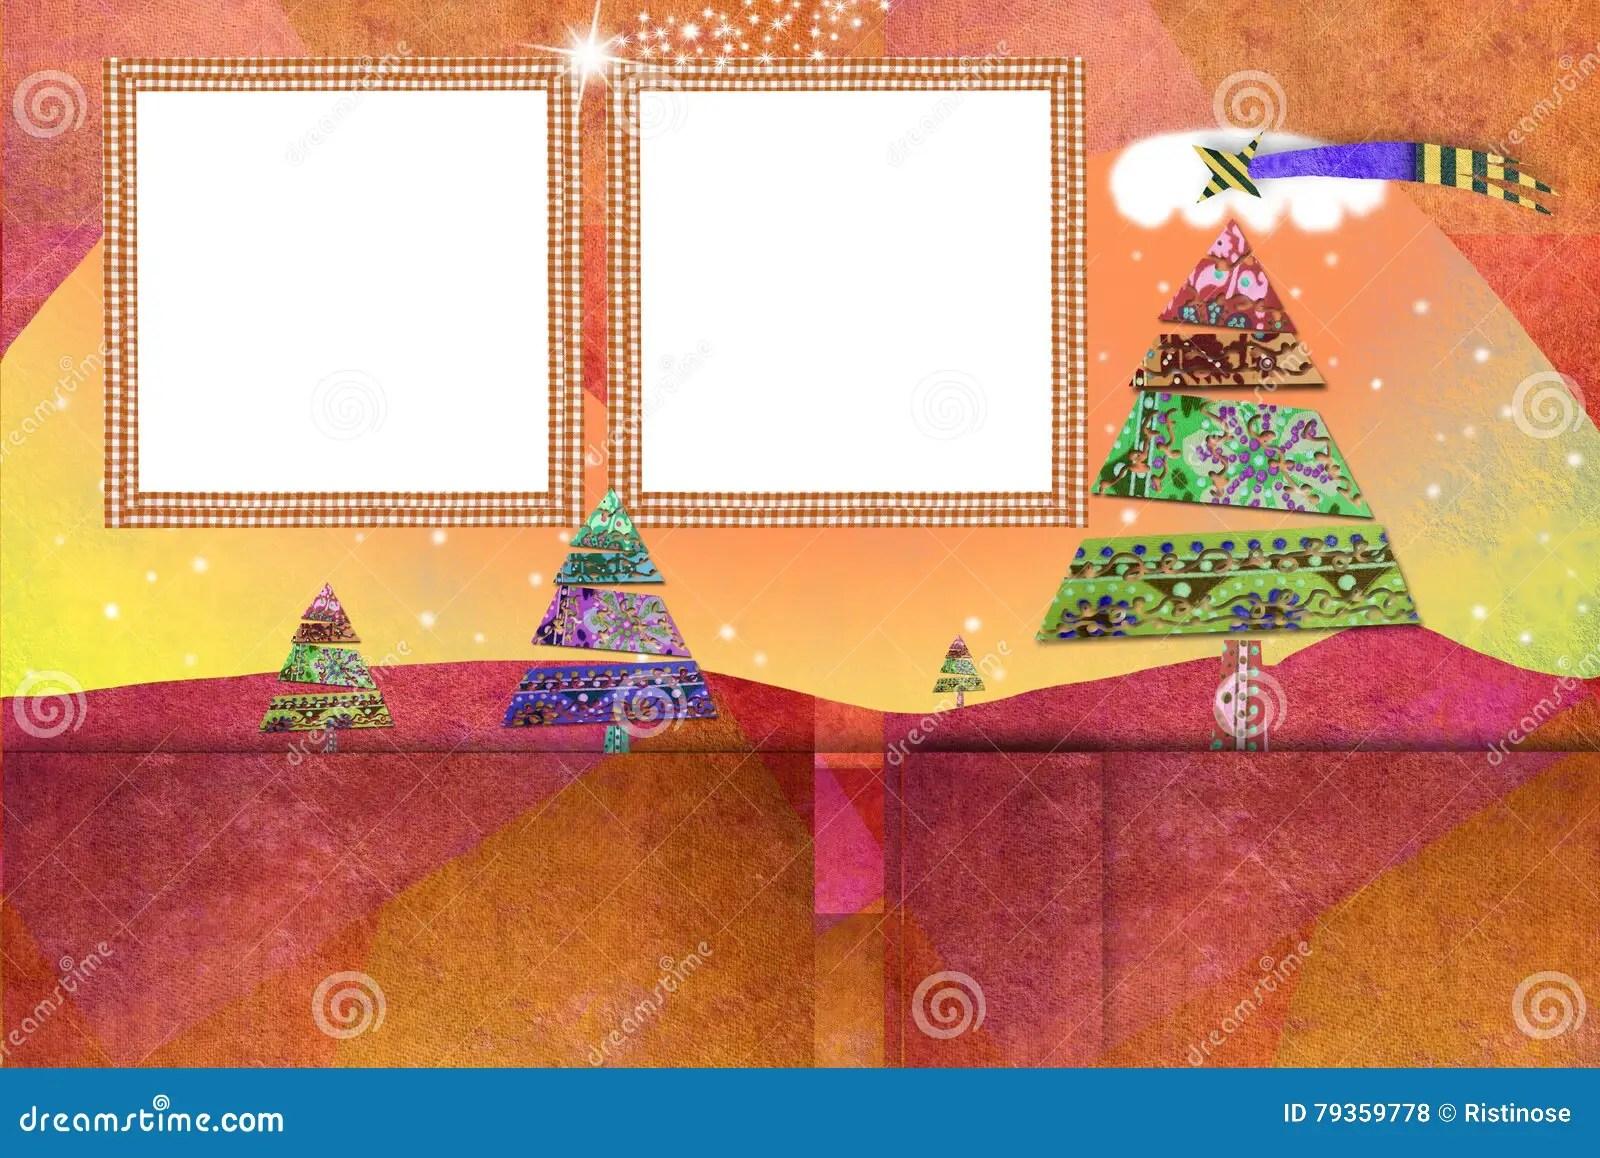 Christmas Two Photo Frames Cards Stock Illustration - Illustration